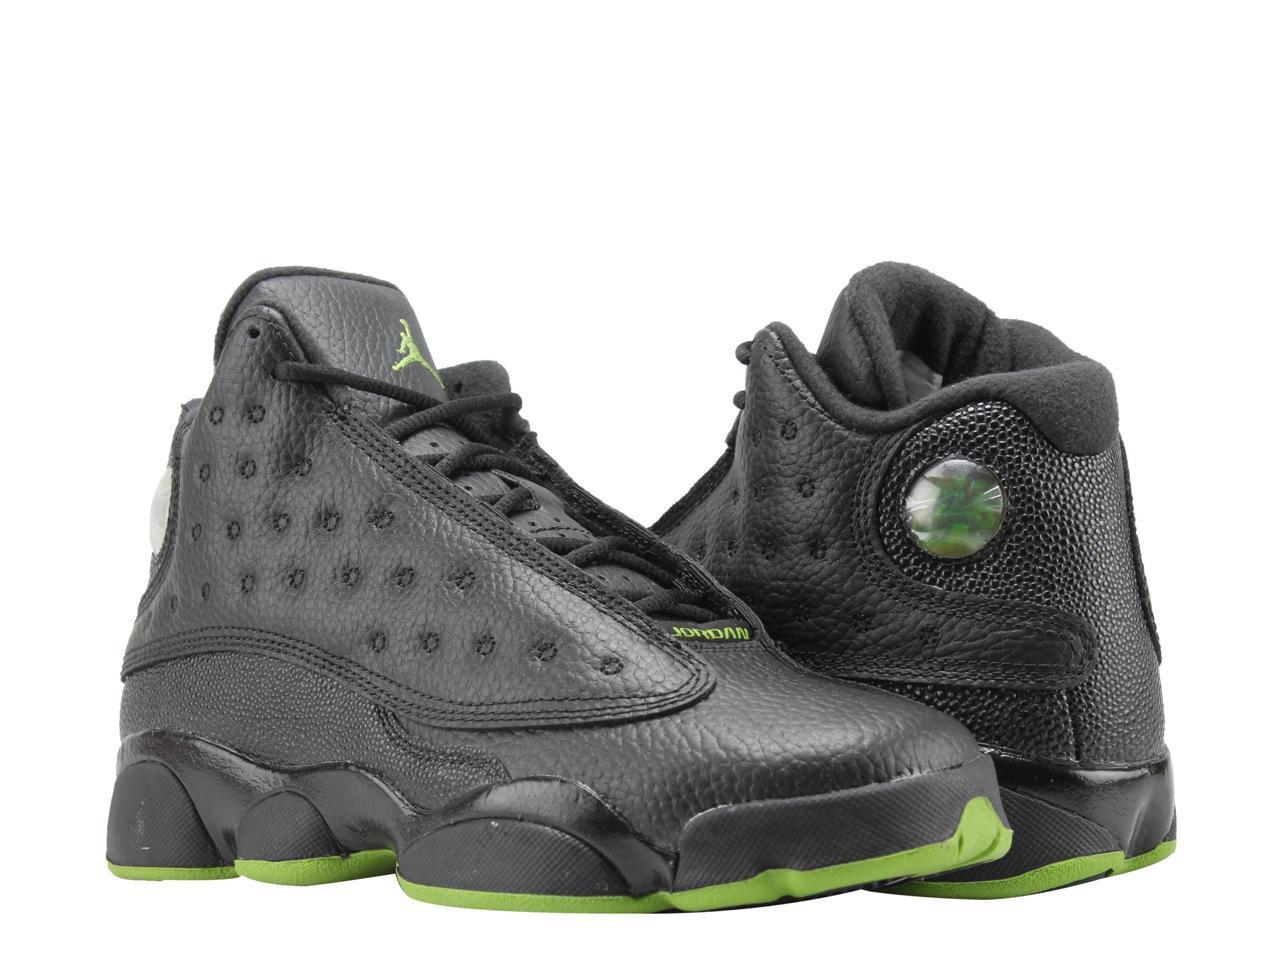 hot sale online c6c0f 8a872 ... low price nike basketball air jordan 13 retro bg black altitude big  kids basketball nike shoes